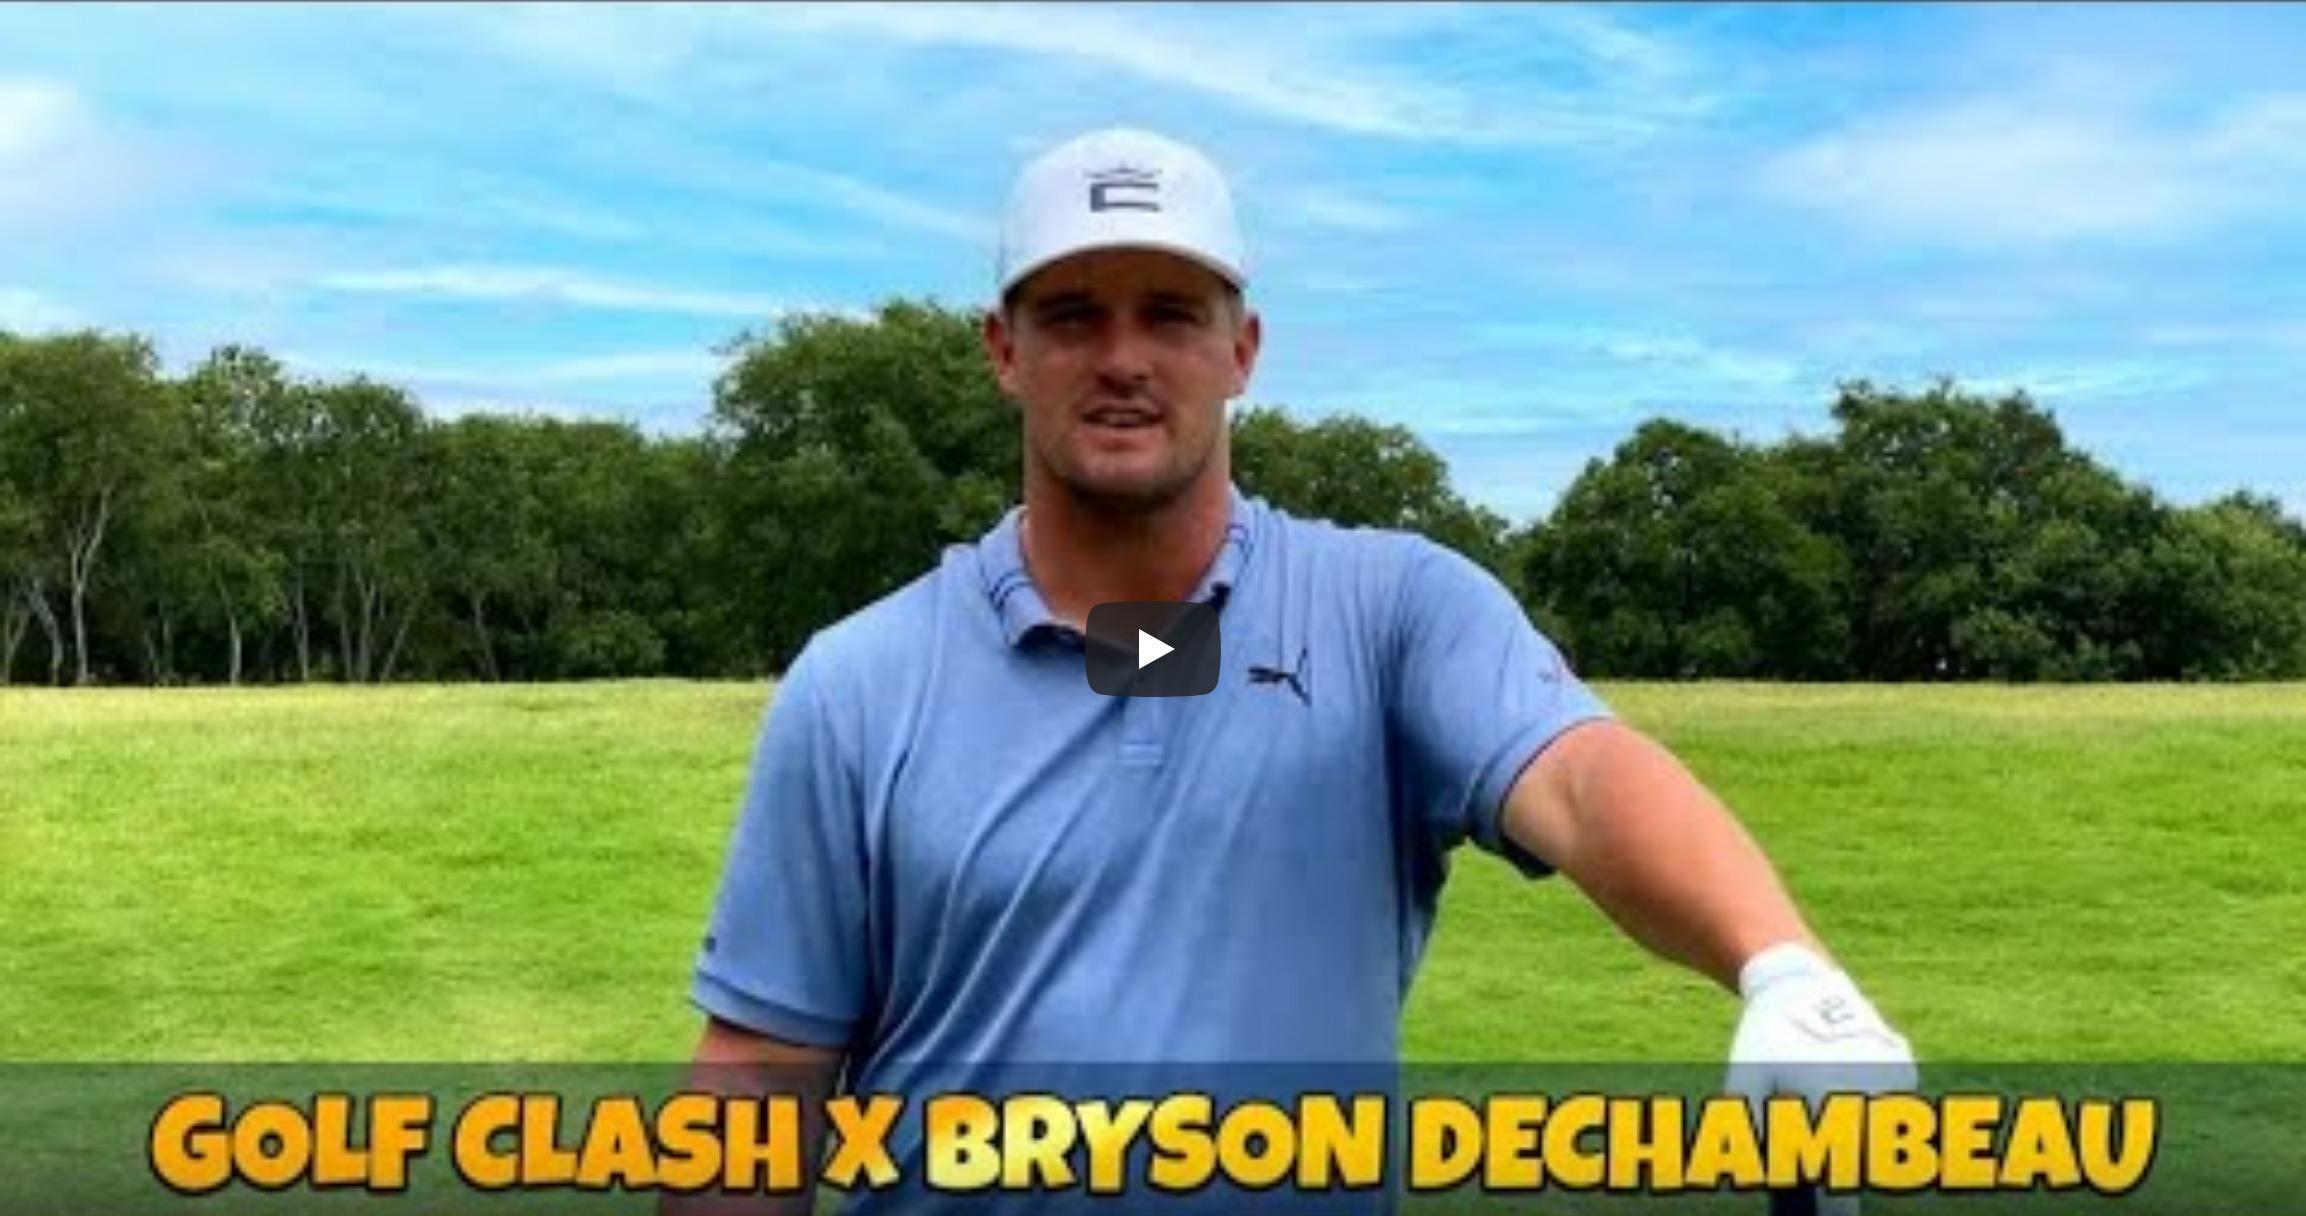 Golf Clash - Bryson DeChambeau Exclusive Content